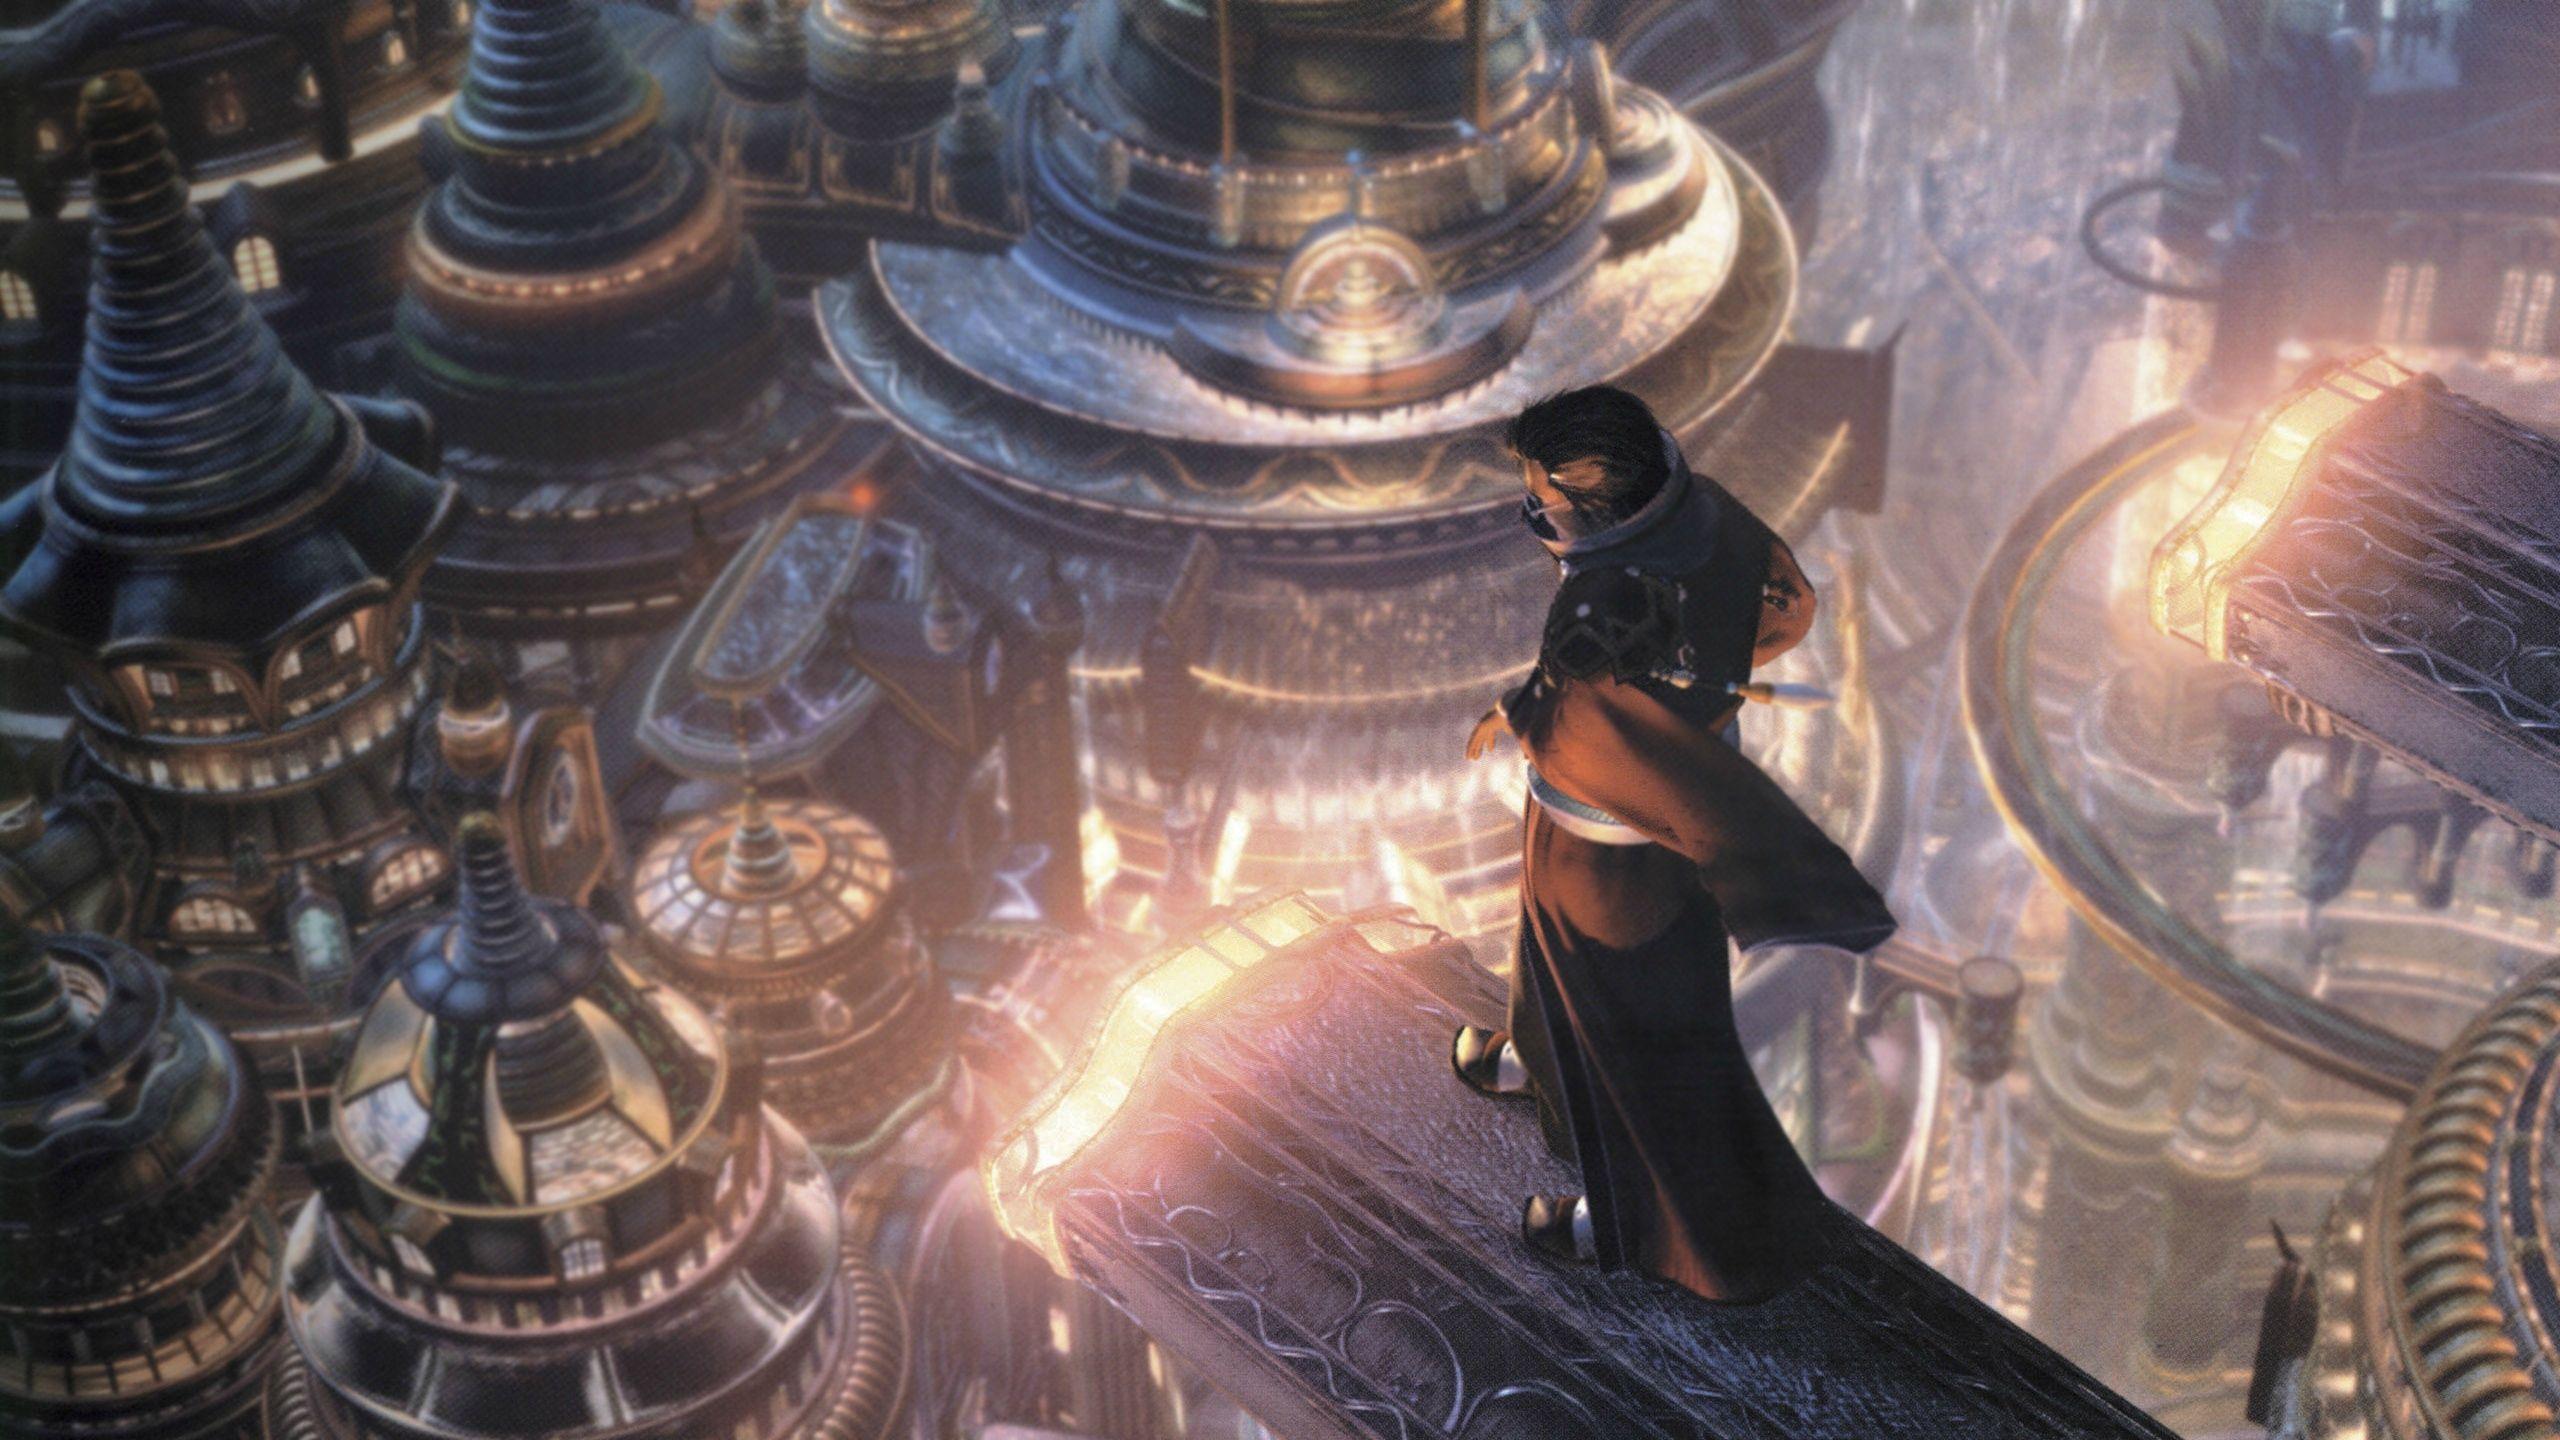 BOTPOST [BOTPOST] Current wallpaper Final Fantasy 10 Auron iimgur 2560x1440